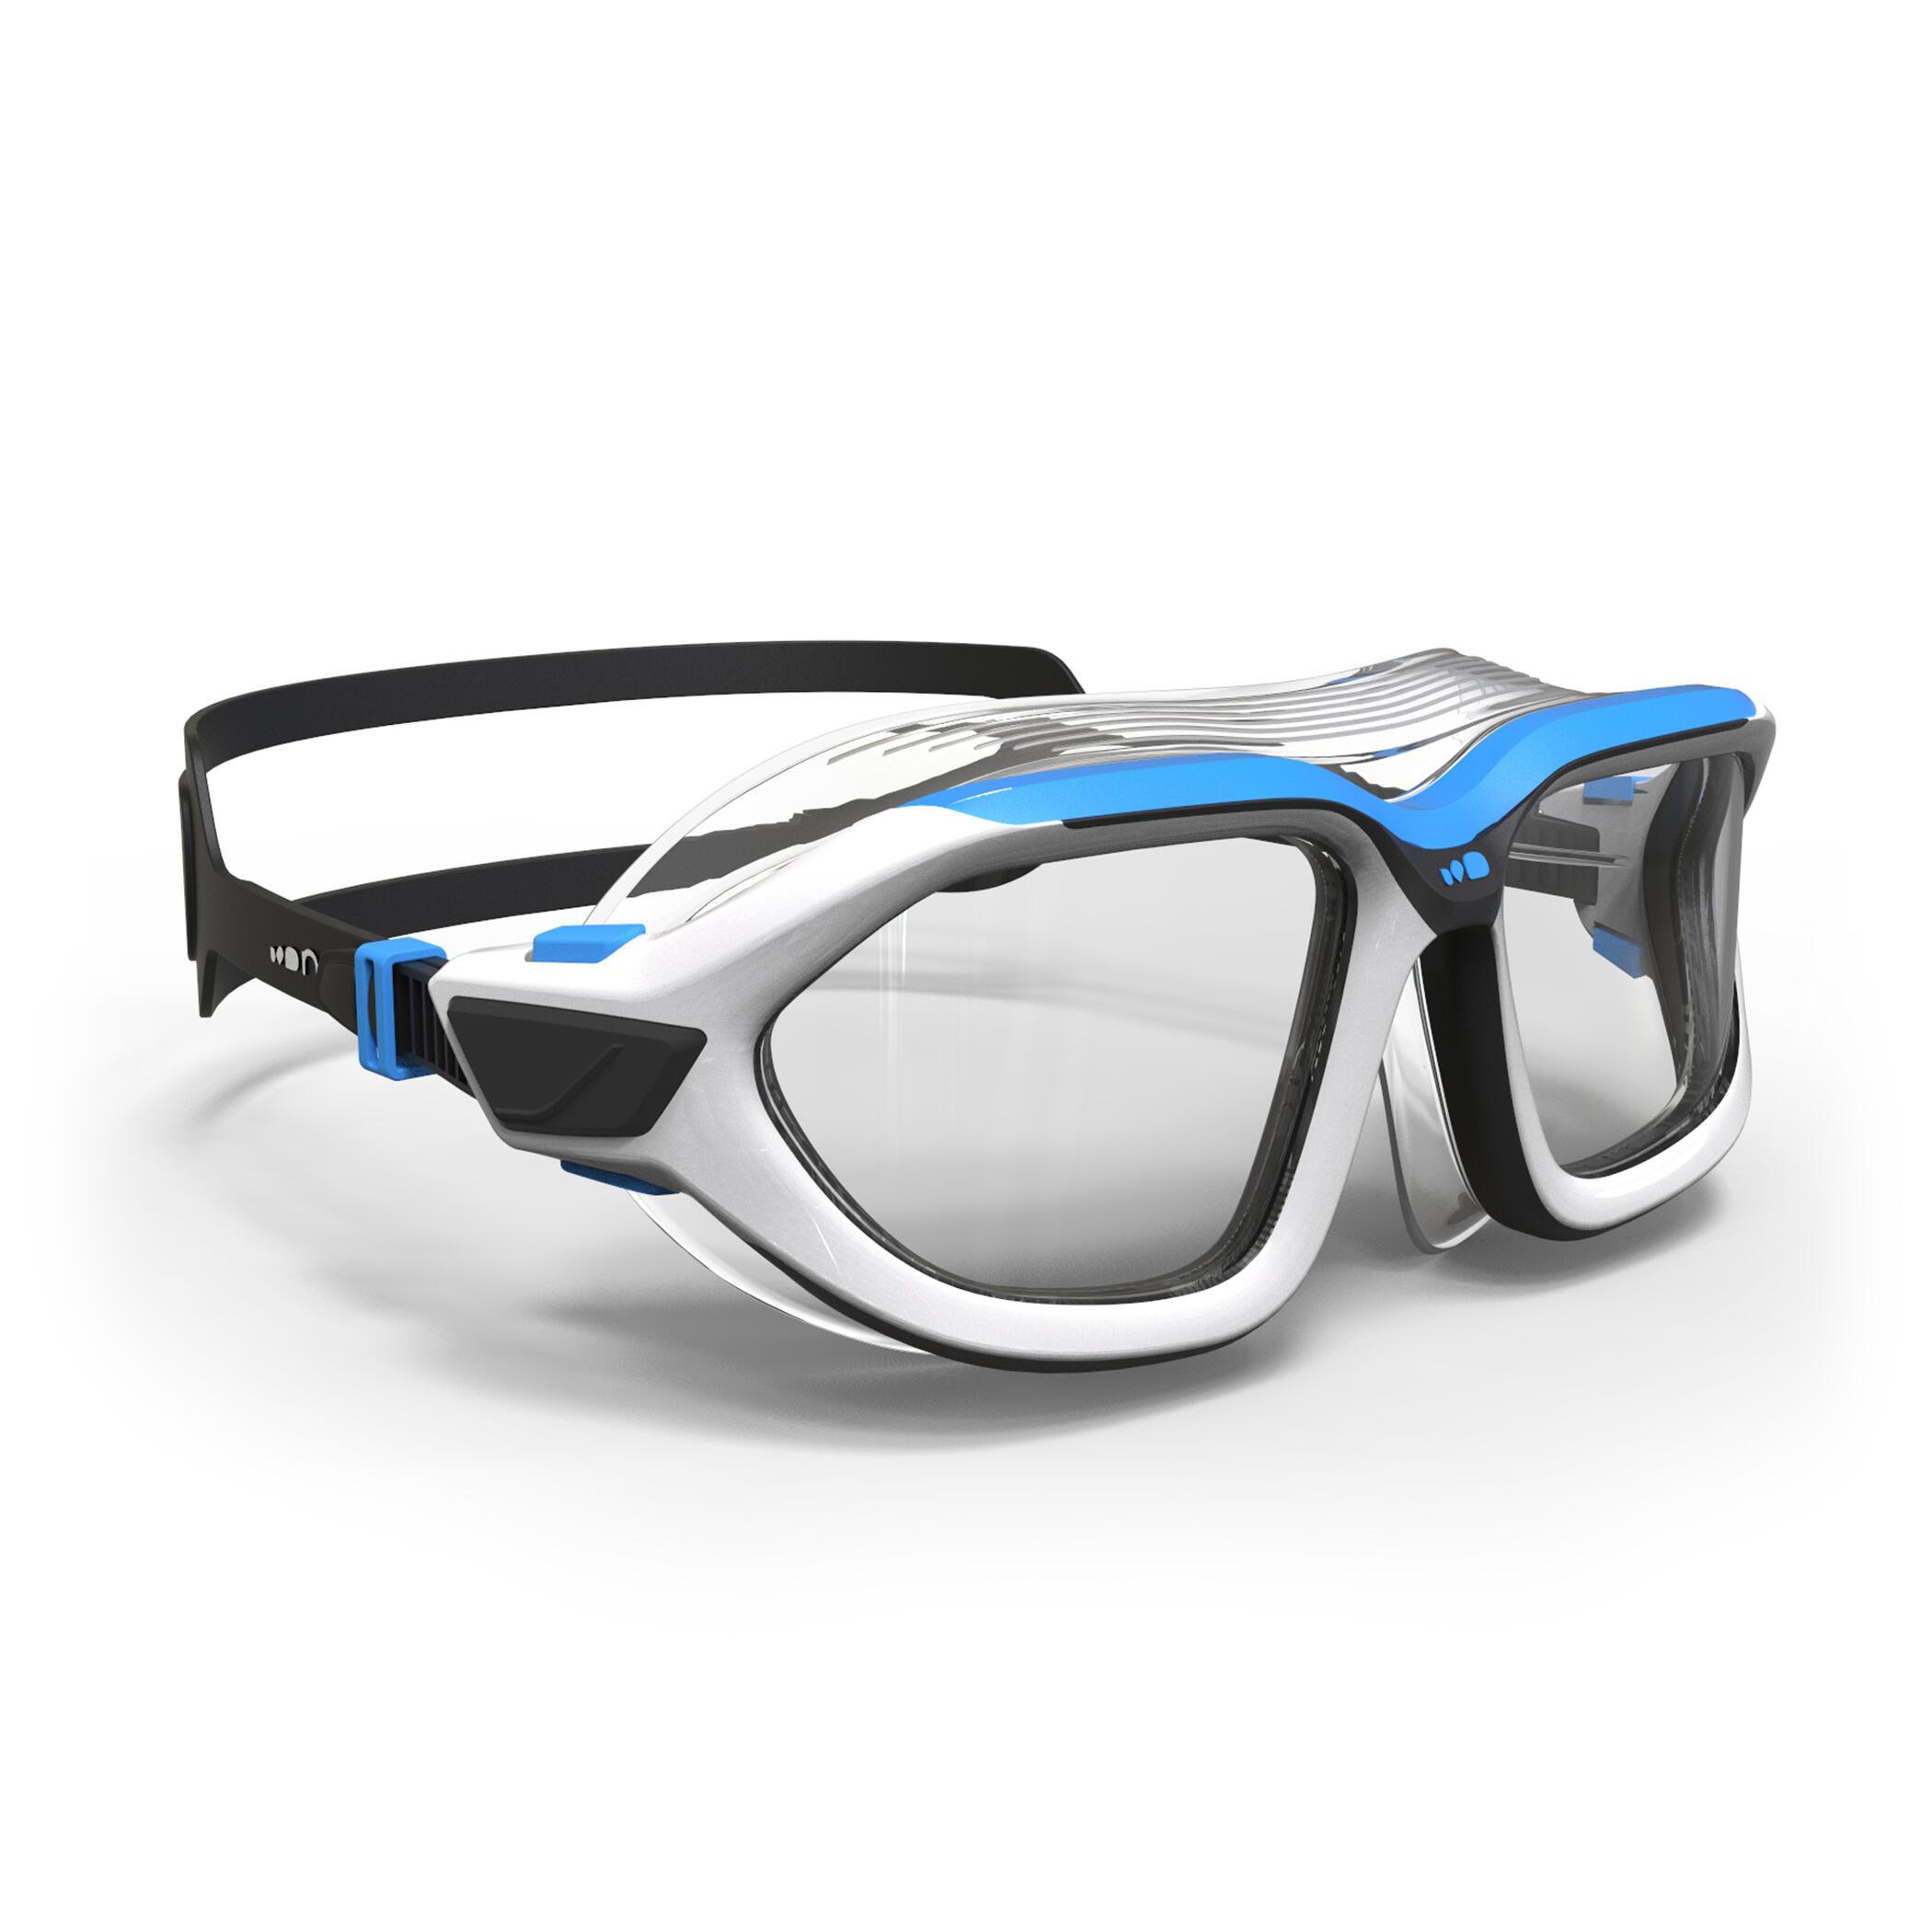 Masque de natation ACTIVE blanc bleu Taille P